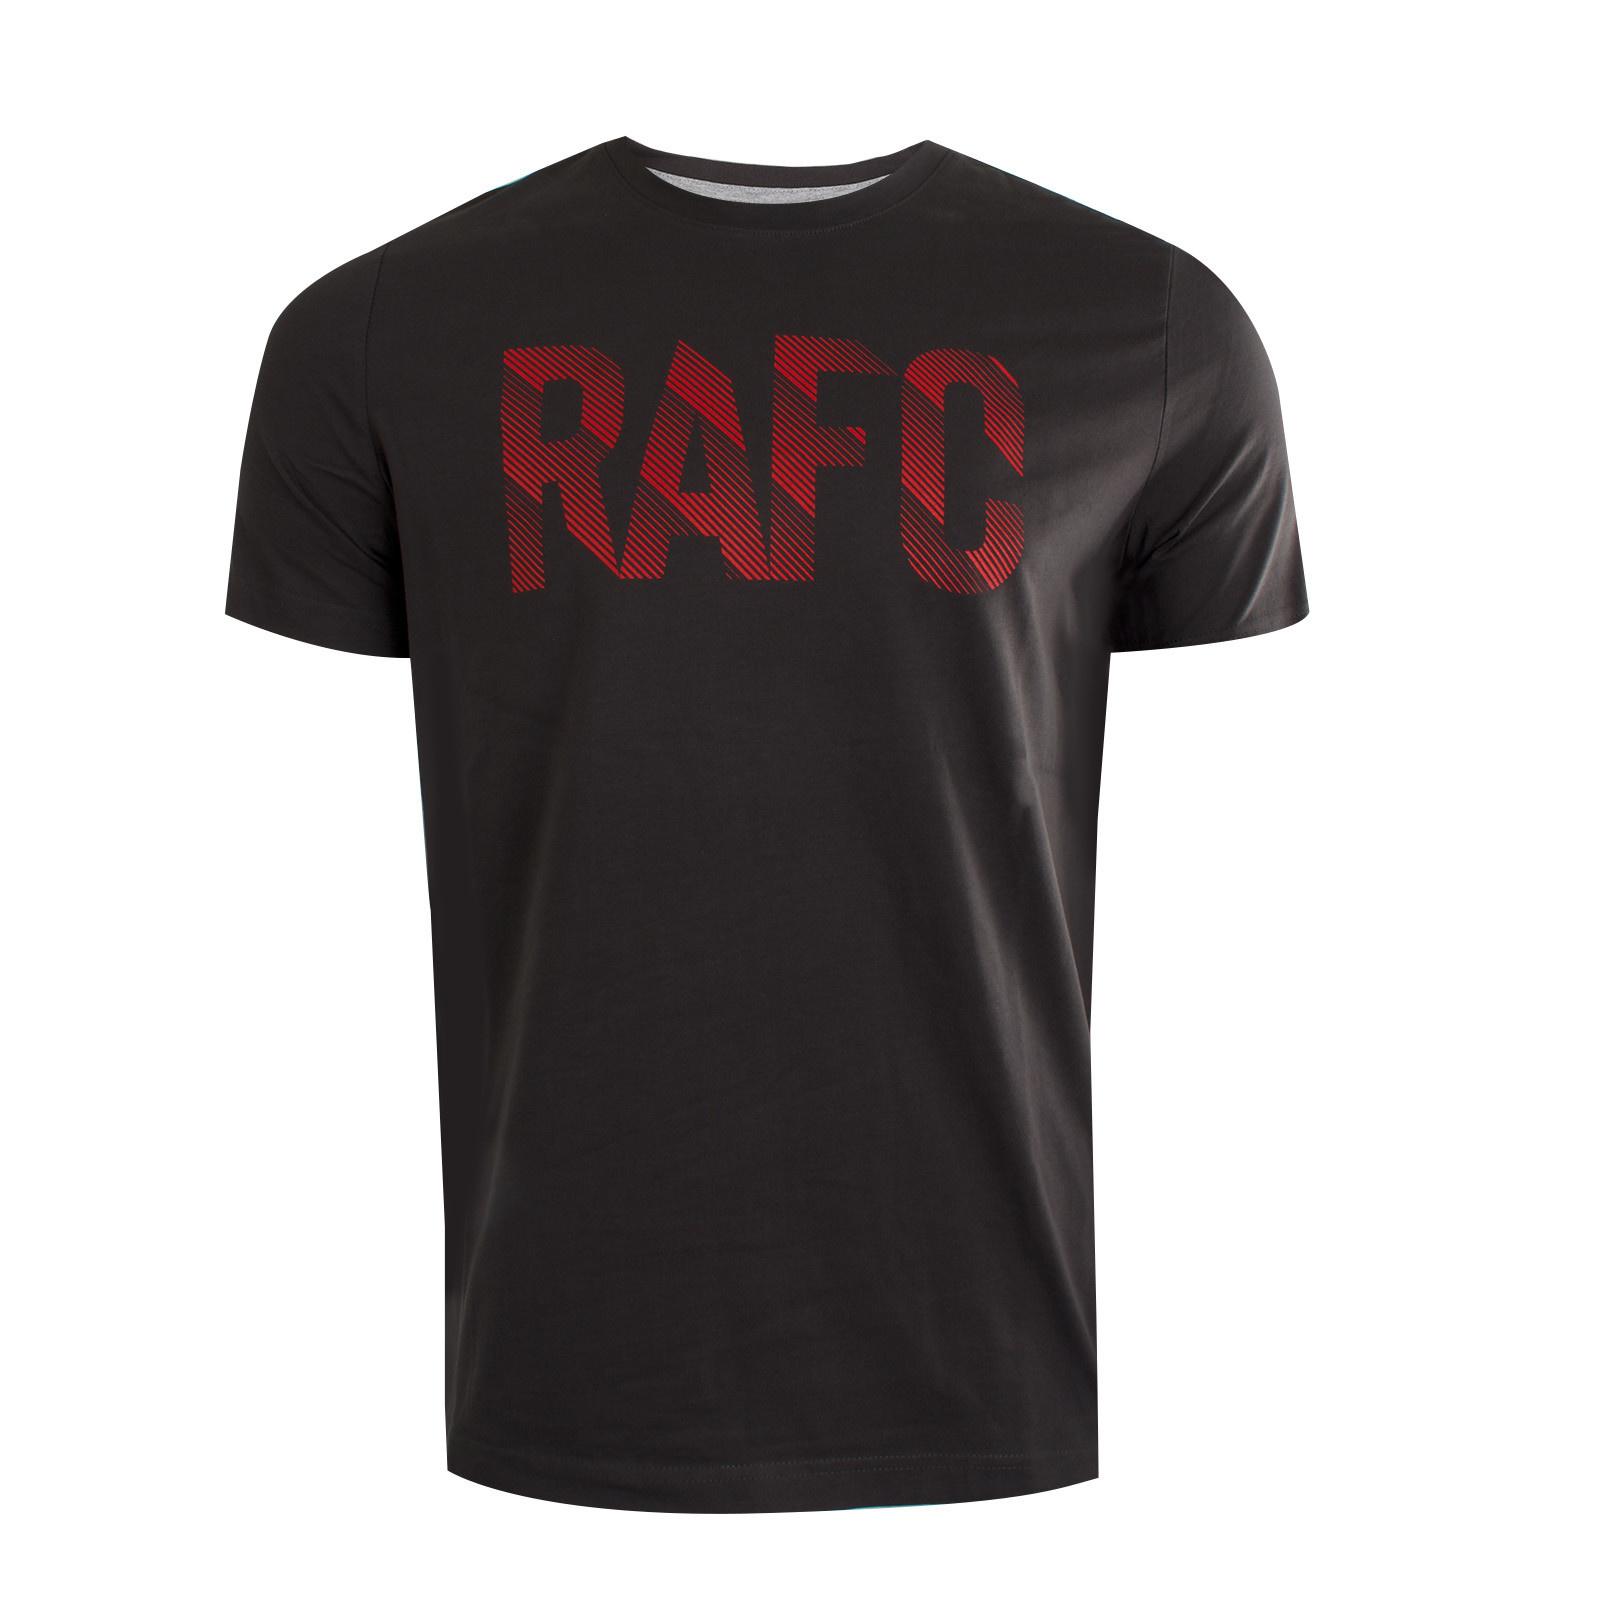 RAFC T-shirt Dark Grey-3